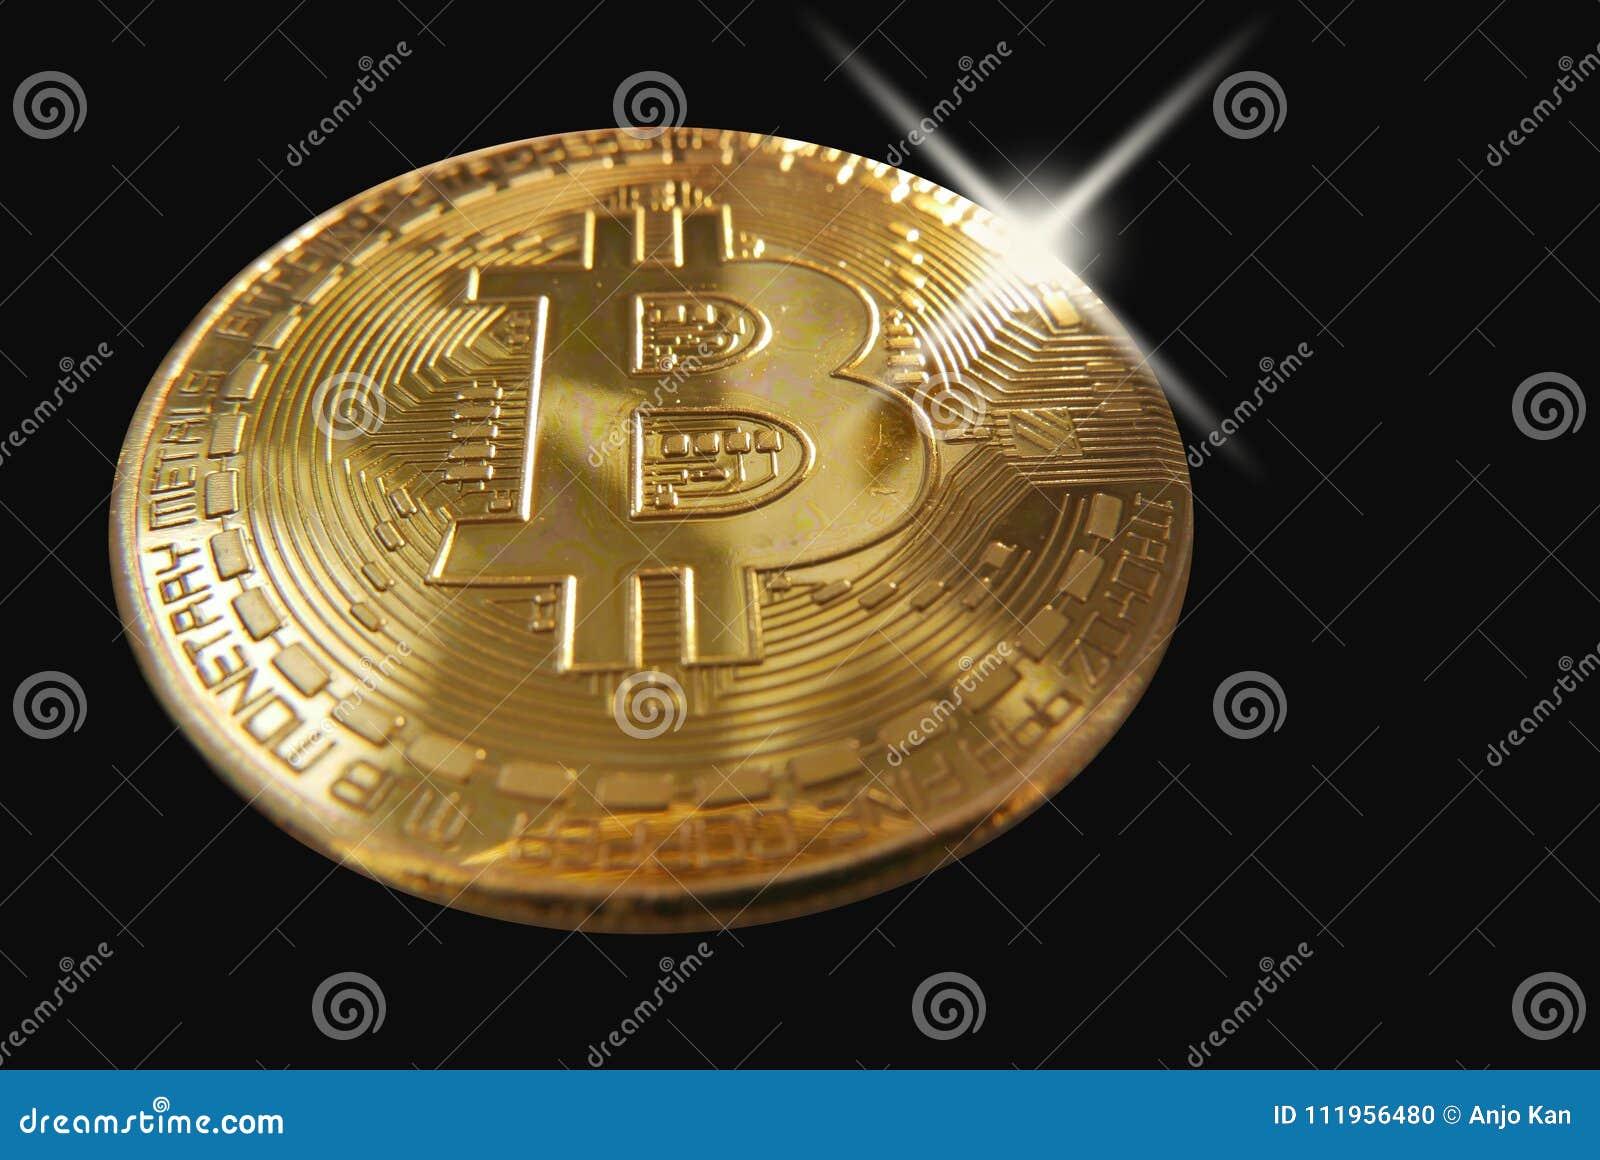 Bling σε ένα bitcoin